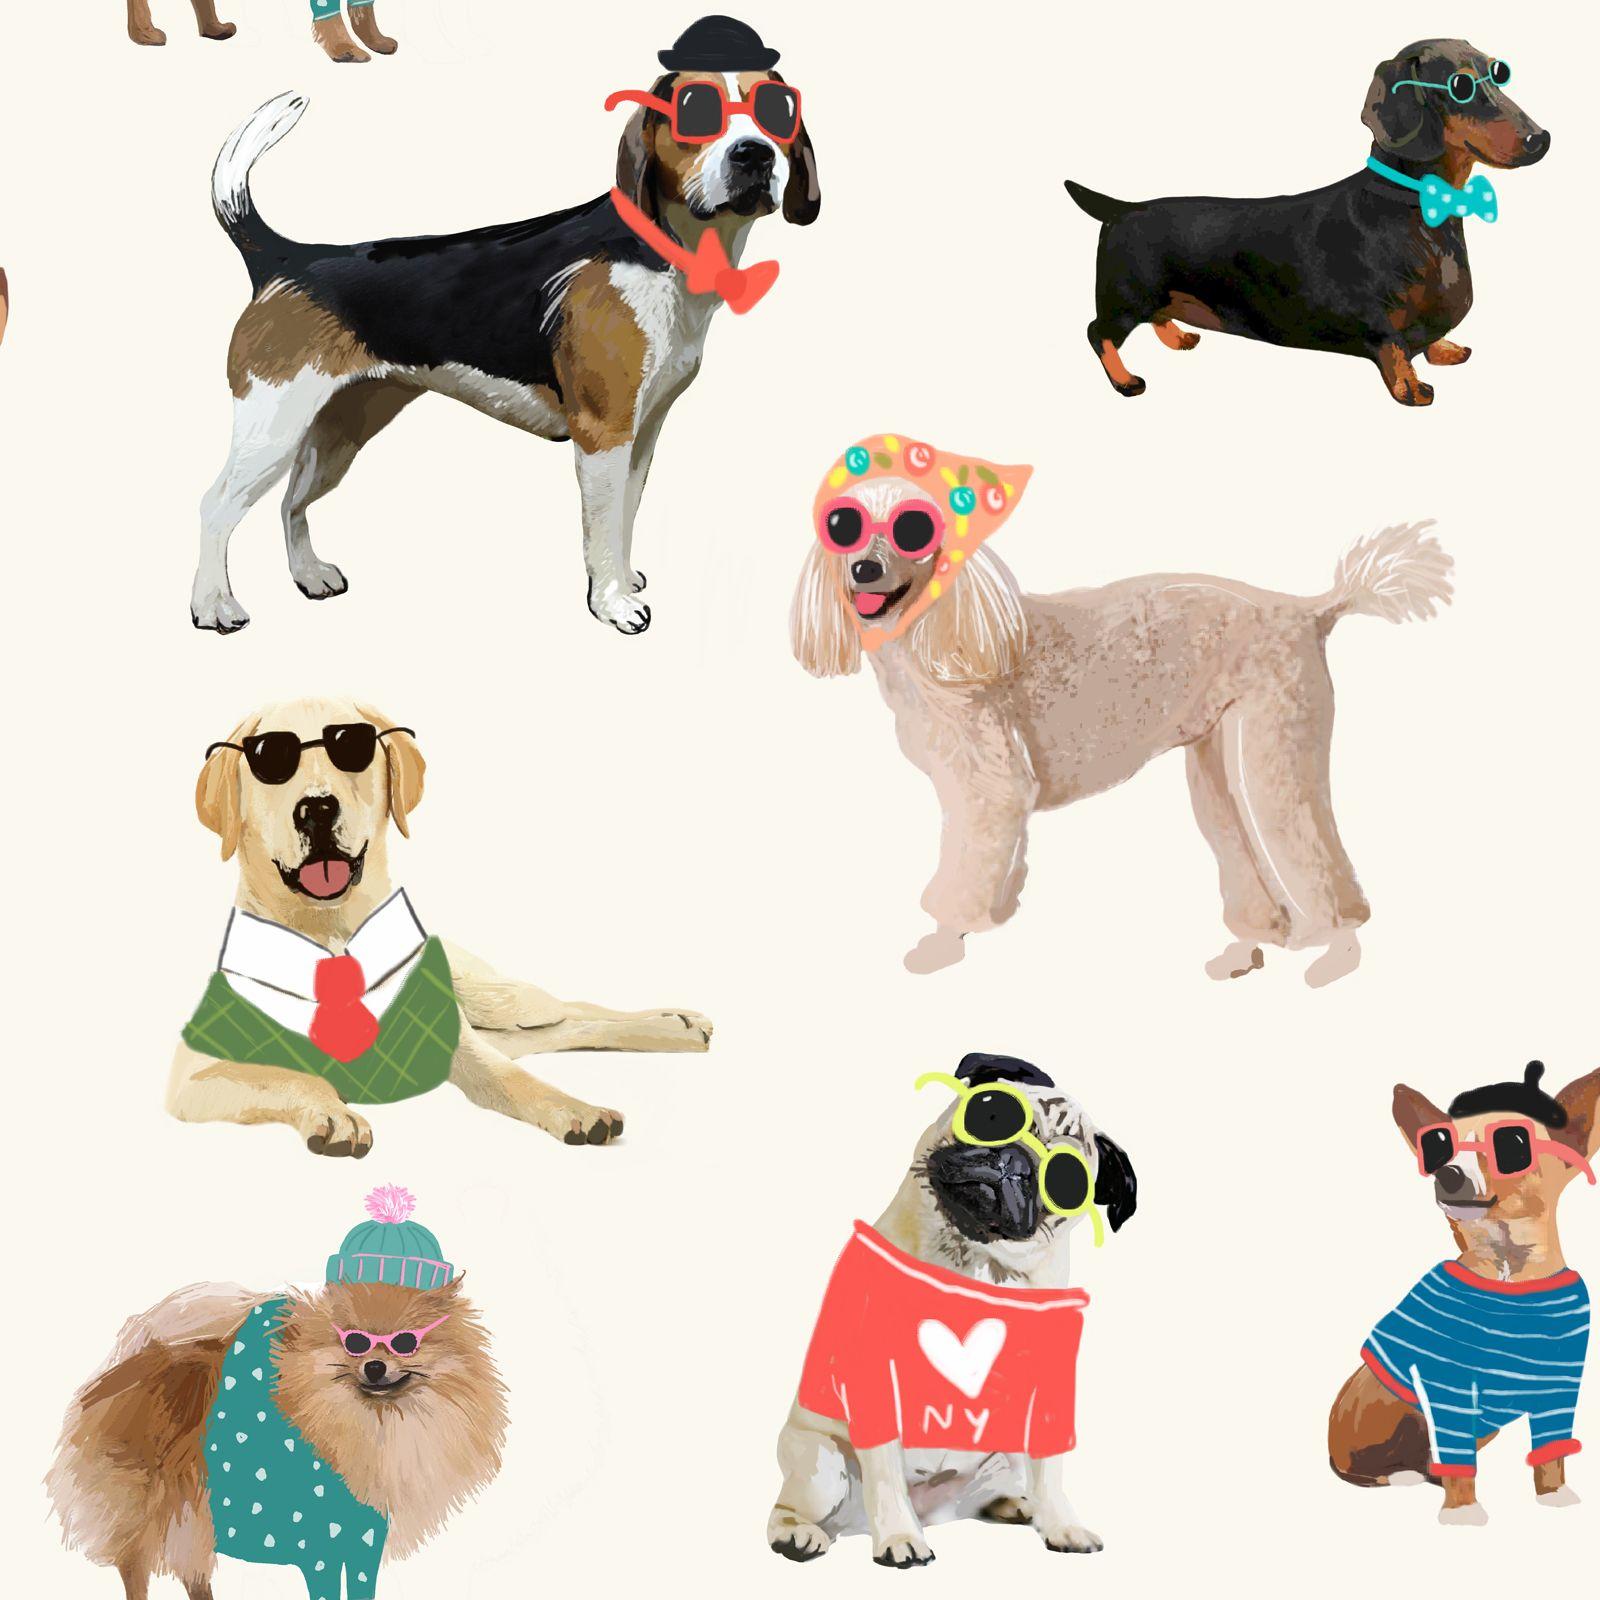 dog themed wallpaper animal love pug, puppy + various designs